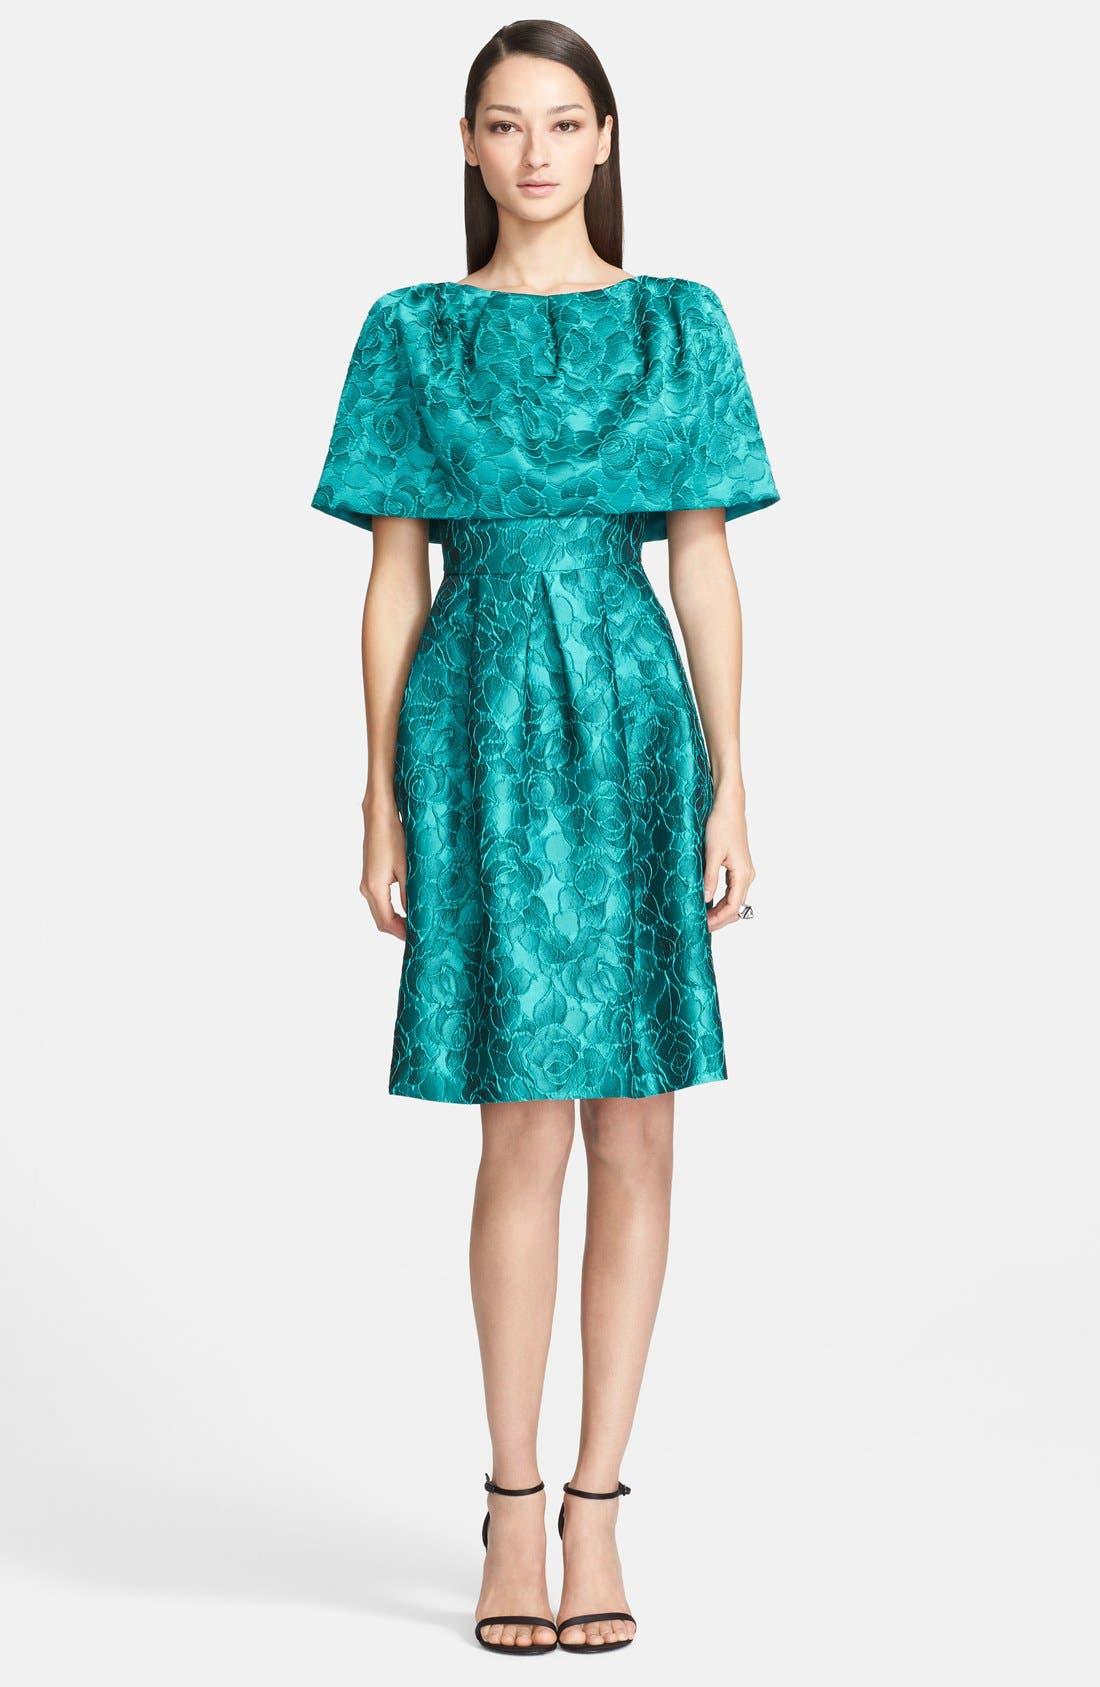 Main Image - St. John Collection 'Shadow Rose' Jacquard Cape Dress